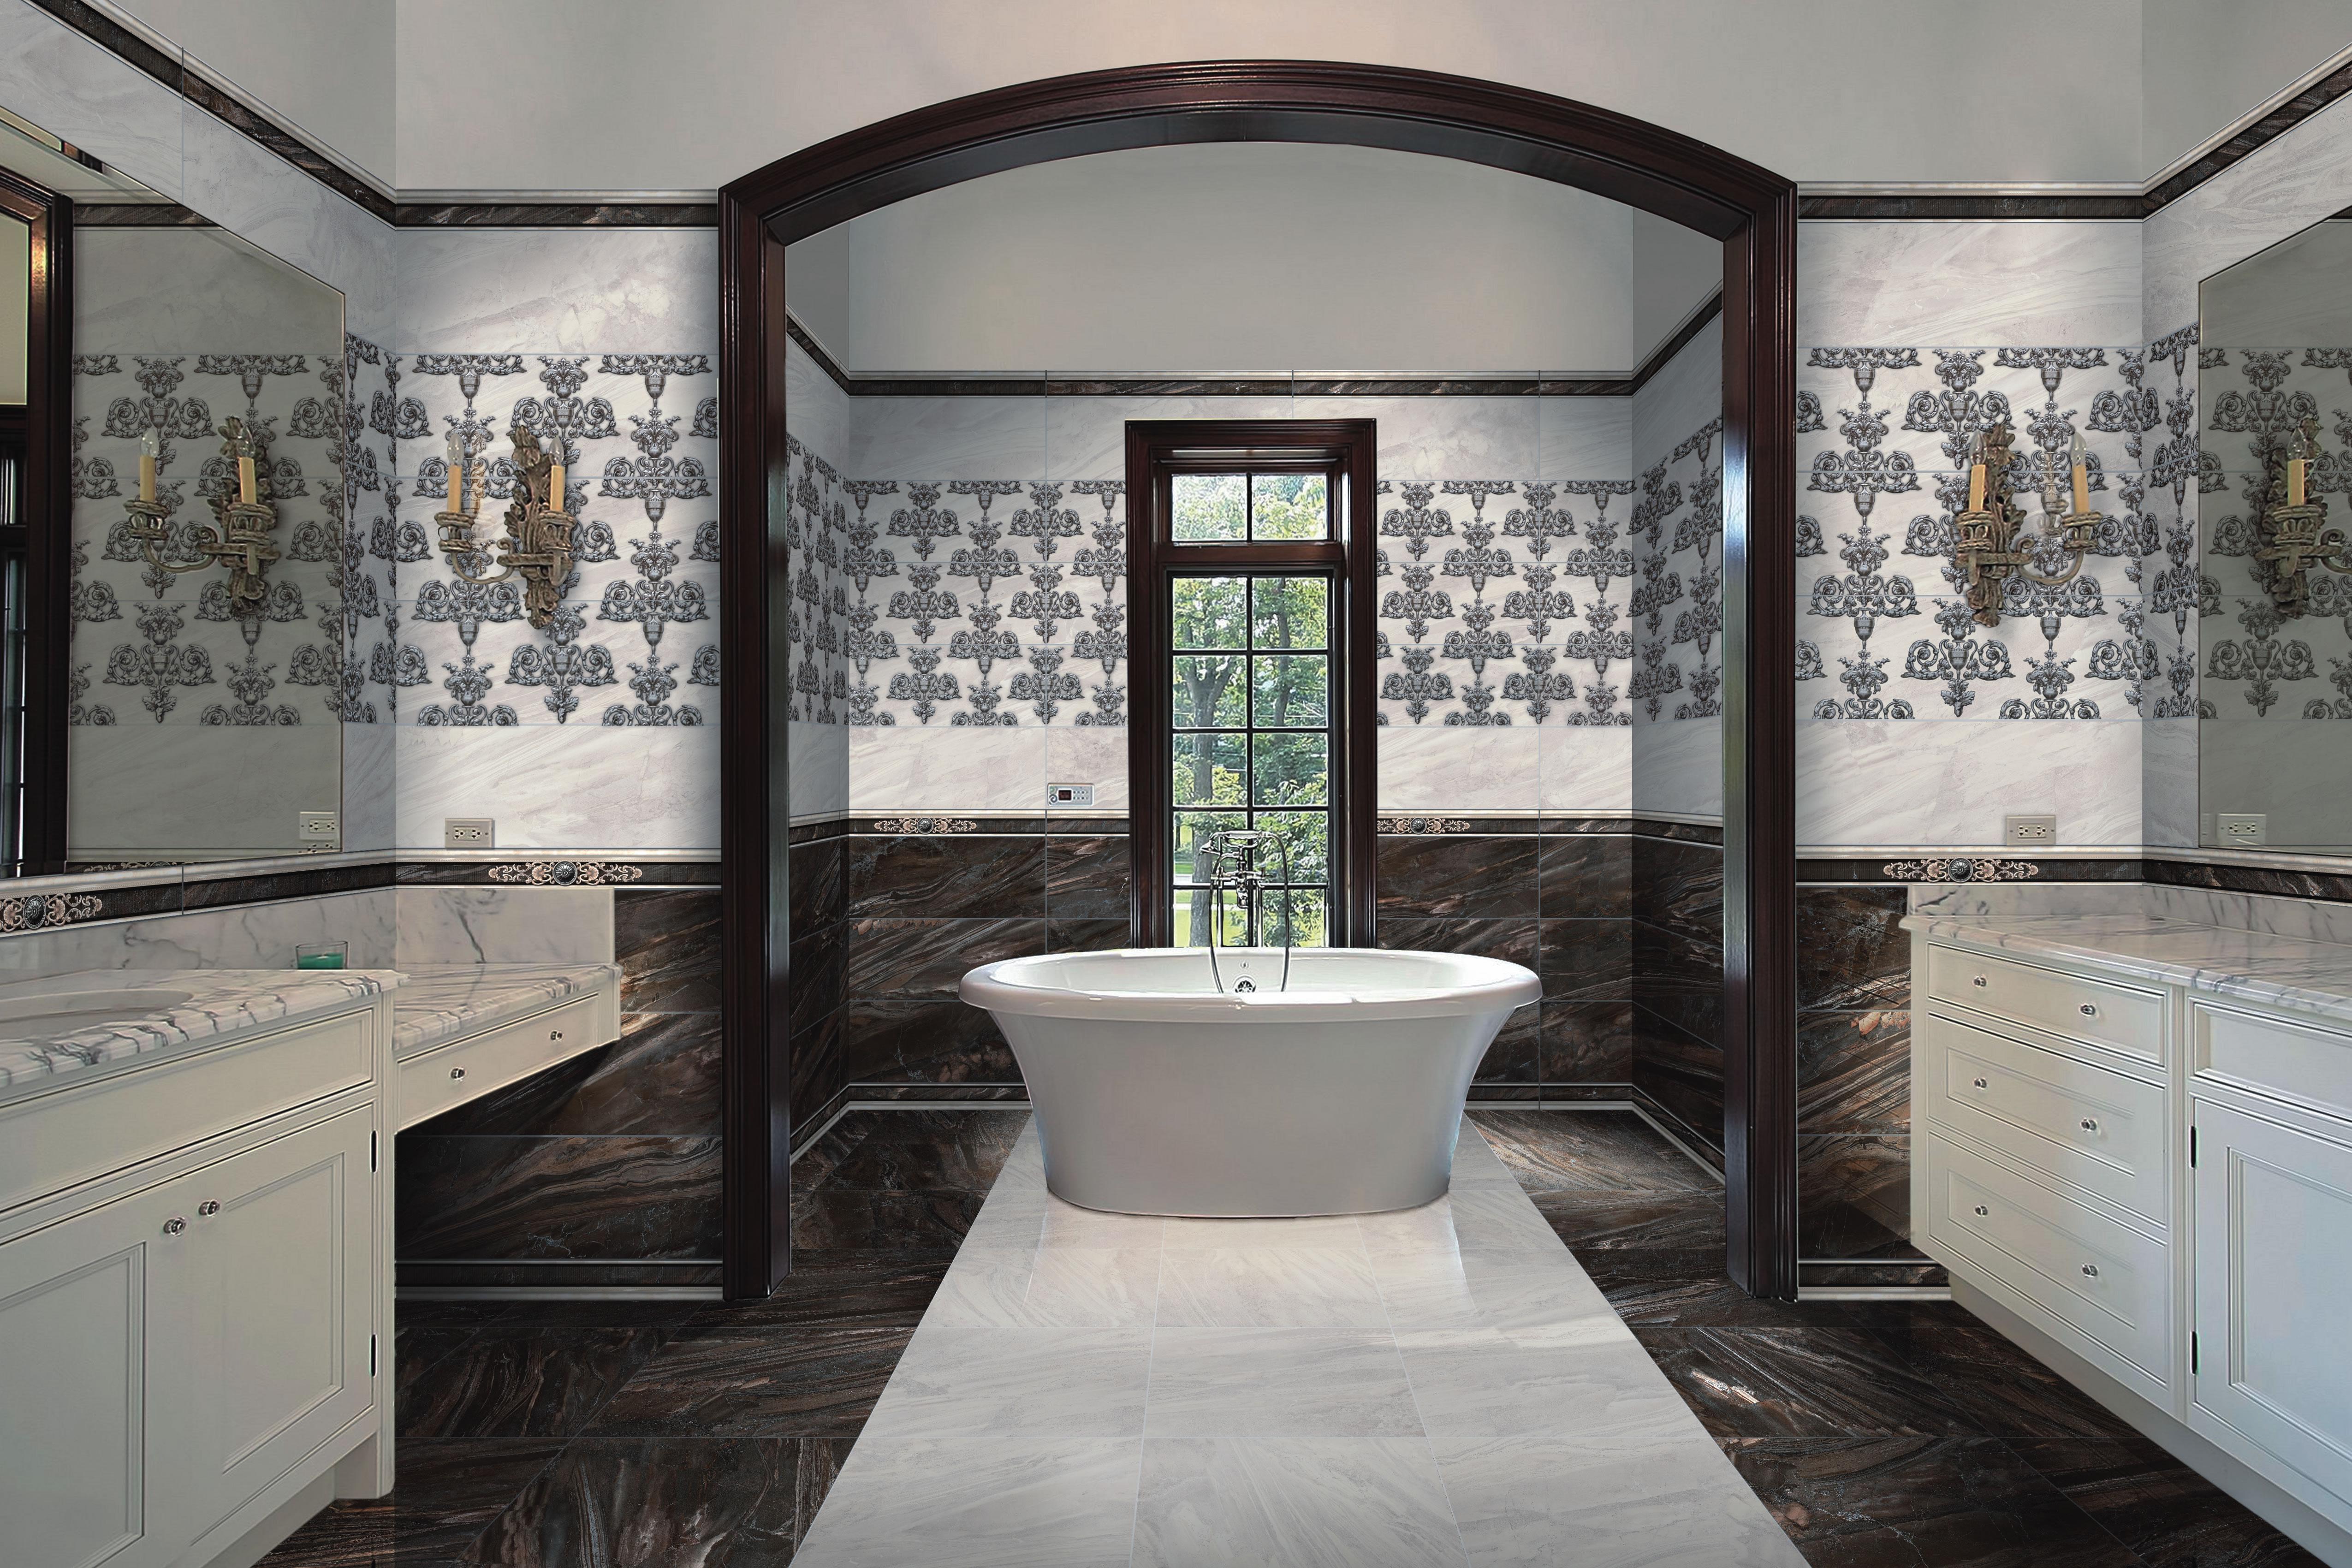 Xian Series 30x90 cm wall tiles